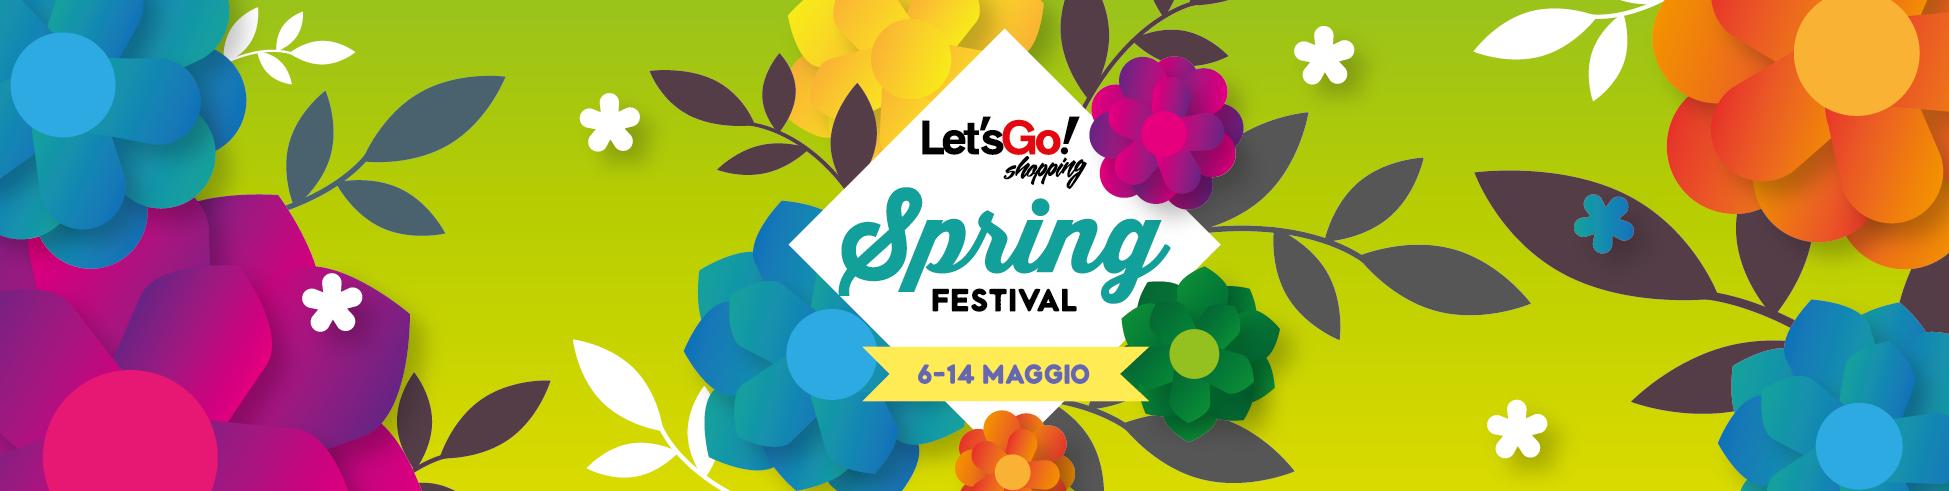 Let's Go Shopping Spring Festival Gorizia